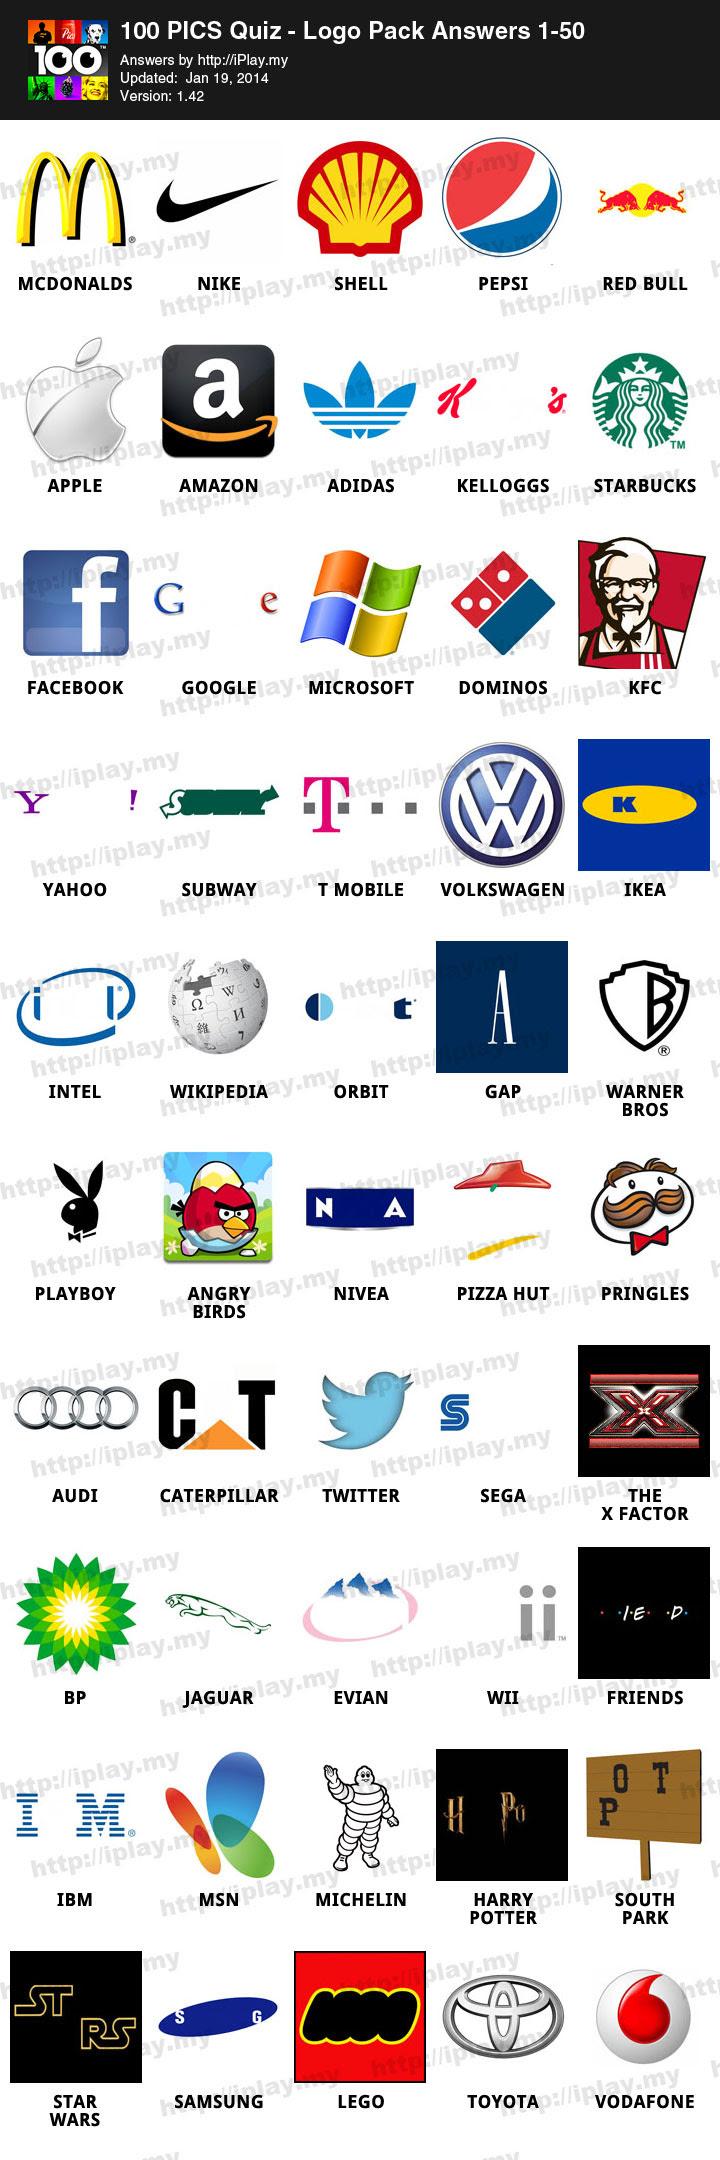 100 Pics Logos Answers 51 100 : logos, answers, Logos, Level